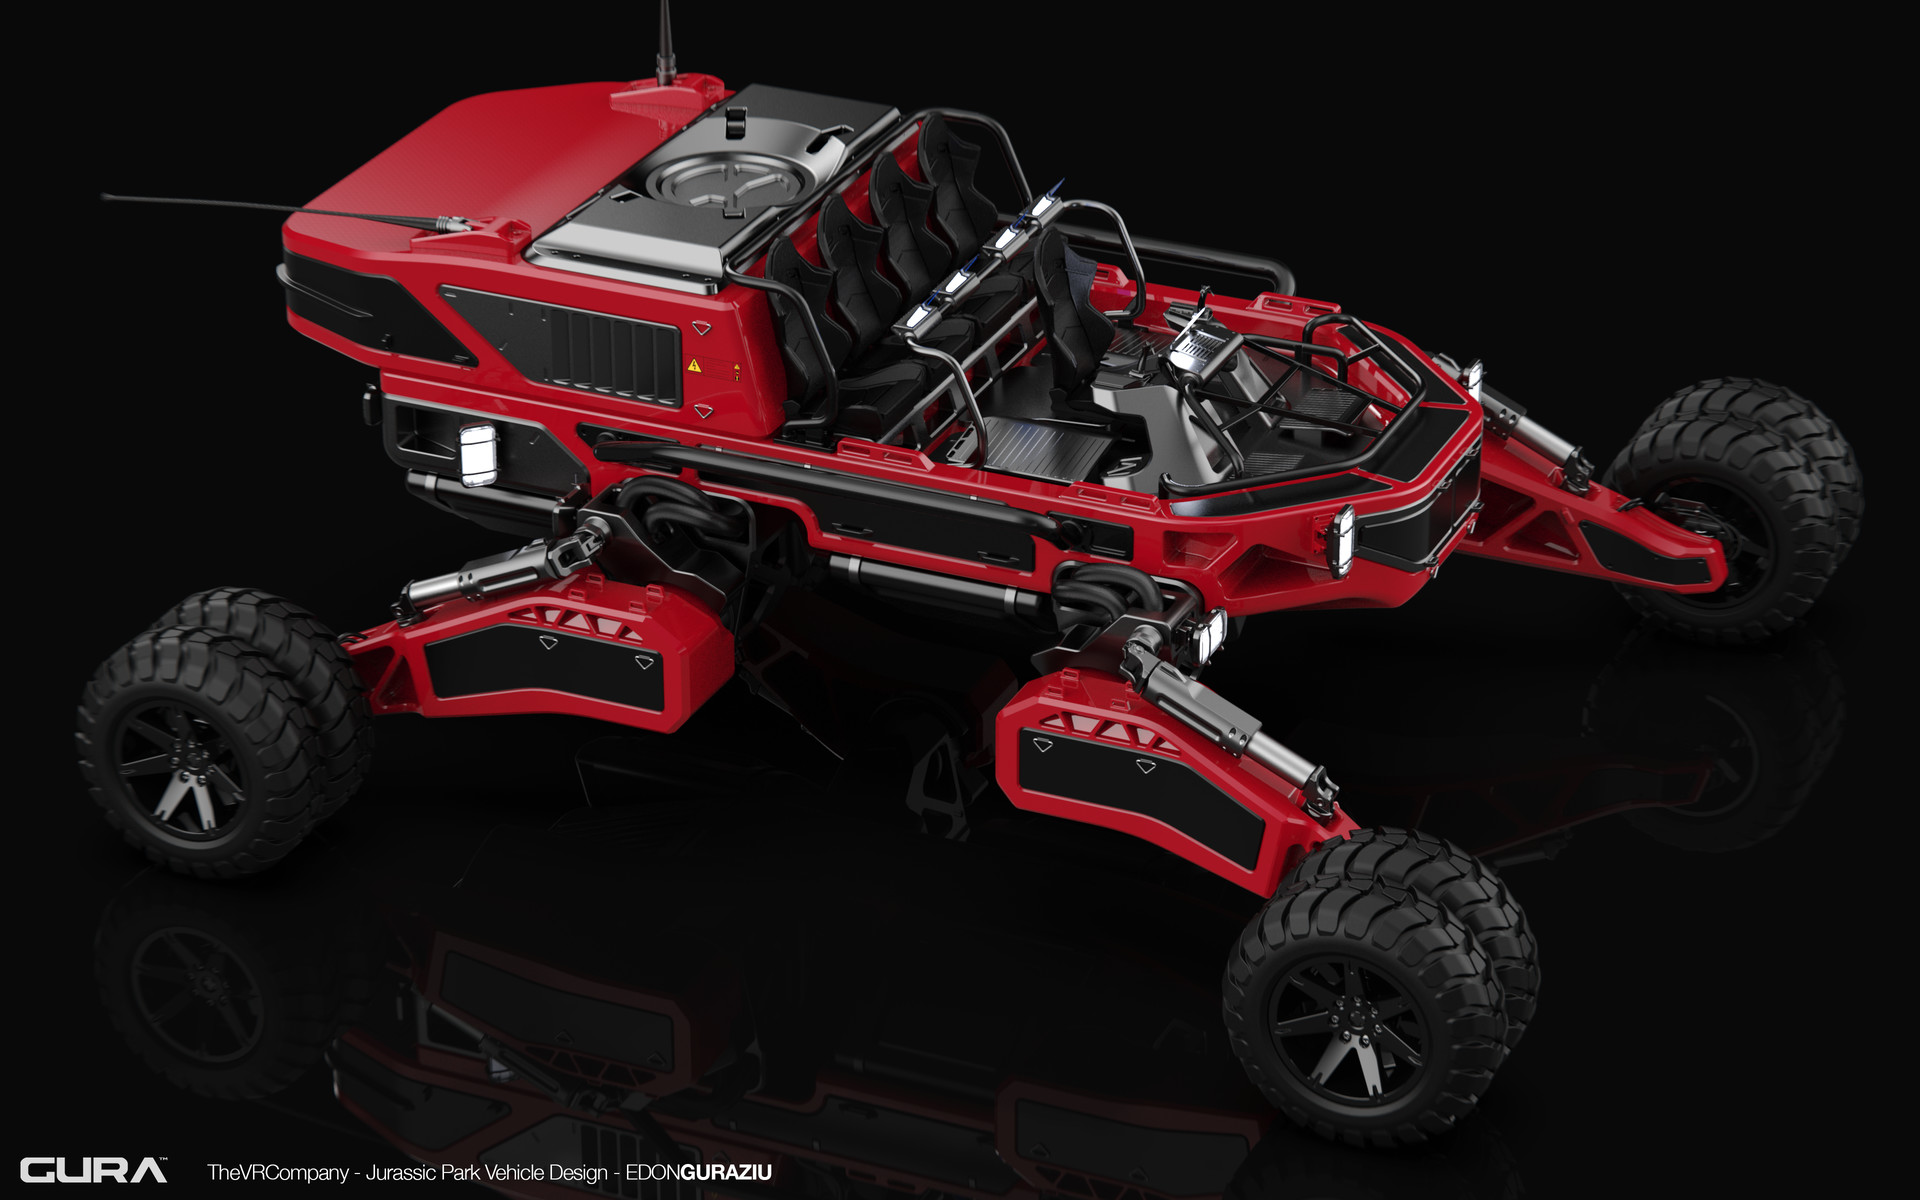 Edon guraziu vr vehicle design